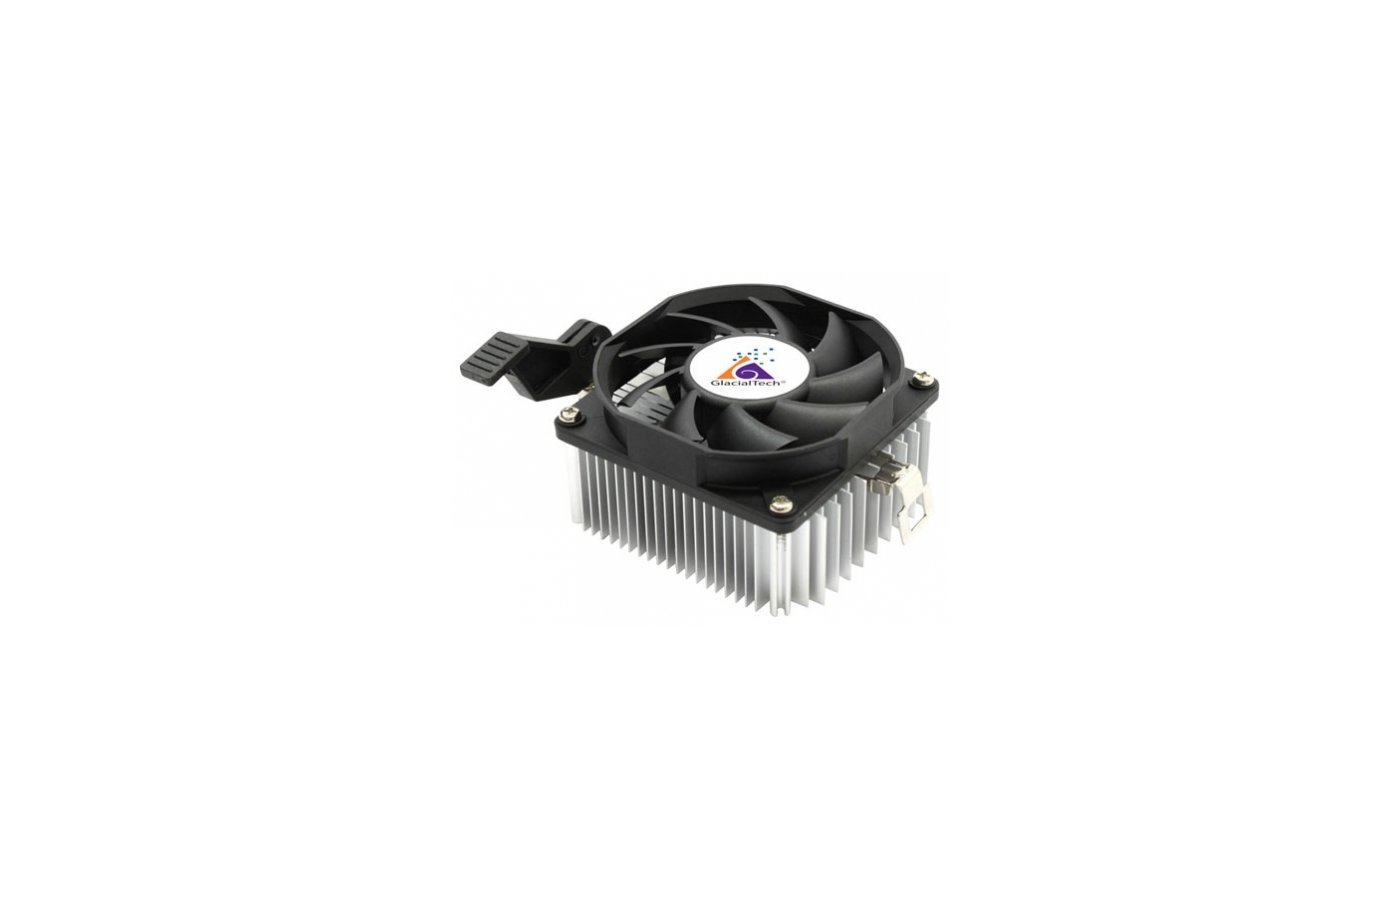 Охлаждение S754/AM2-FM1 GlacialTech Igloo A200 PWM